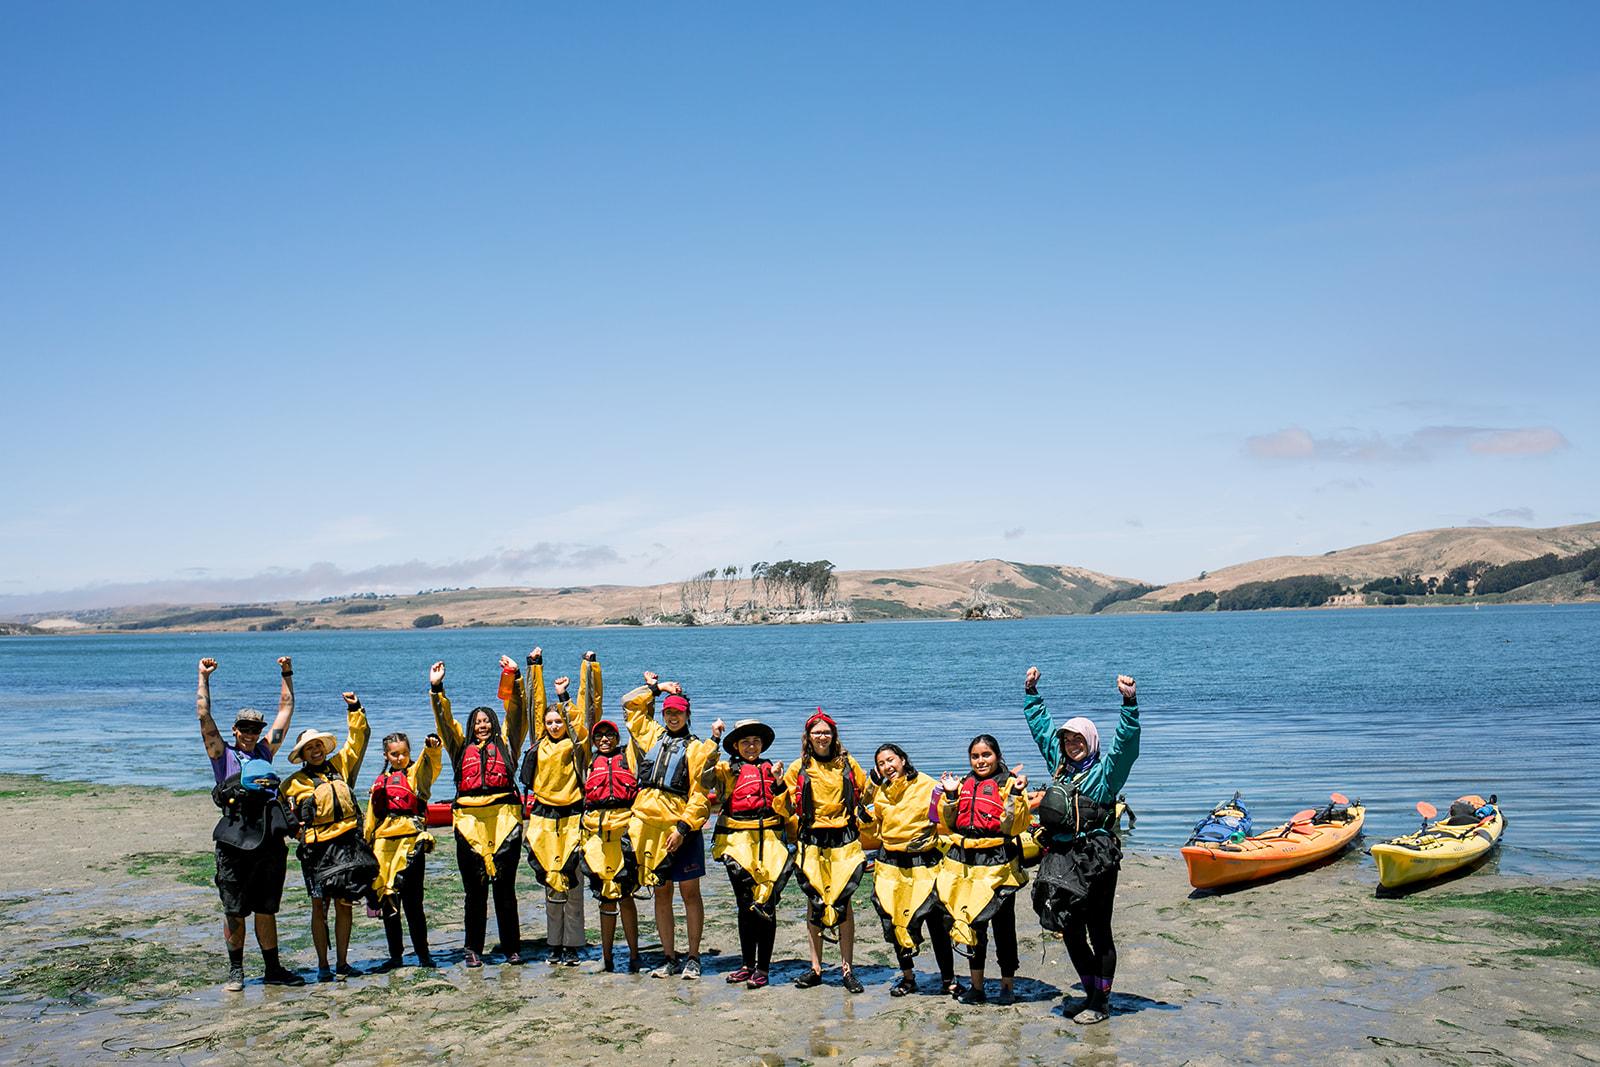 071119_Girl Ventures Kayak Tomales Bay_Eileen Roche Photography_222_websize.jpg